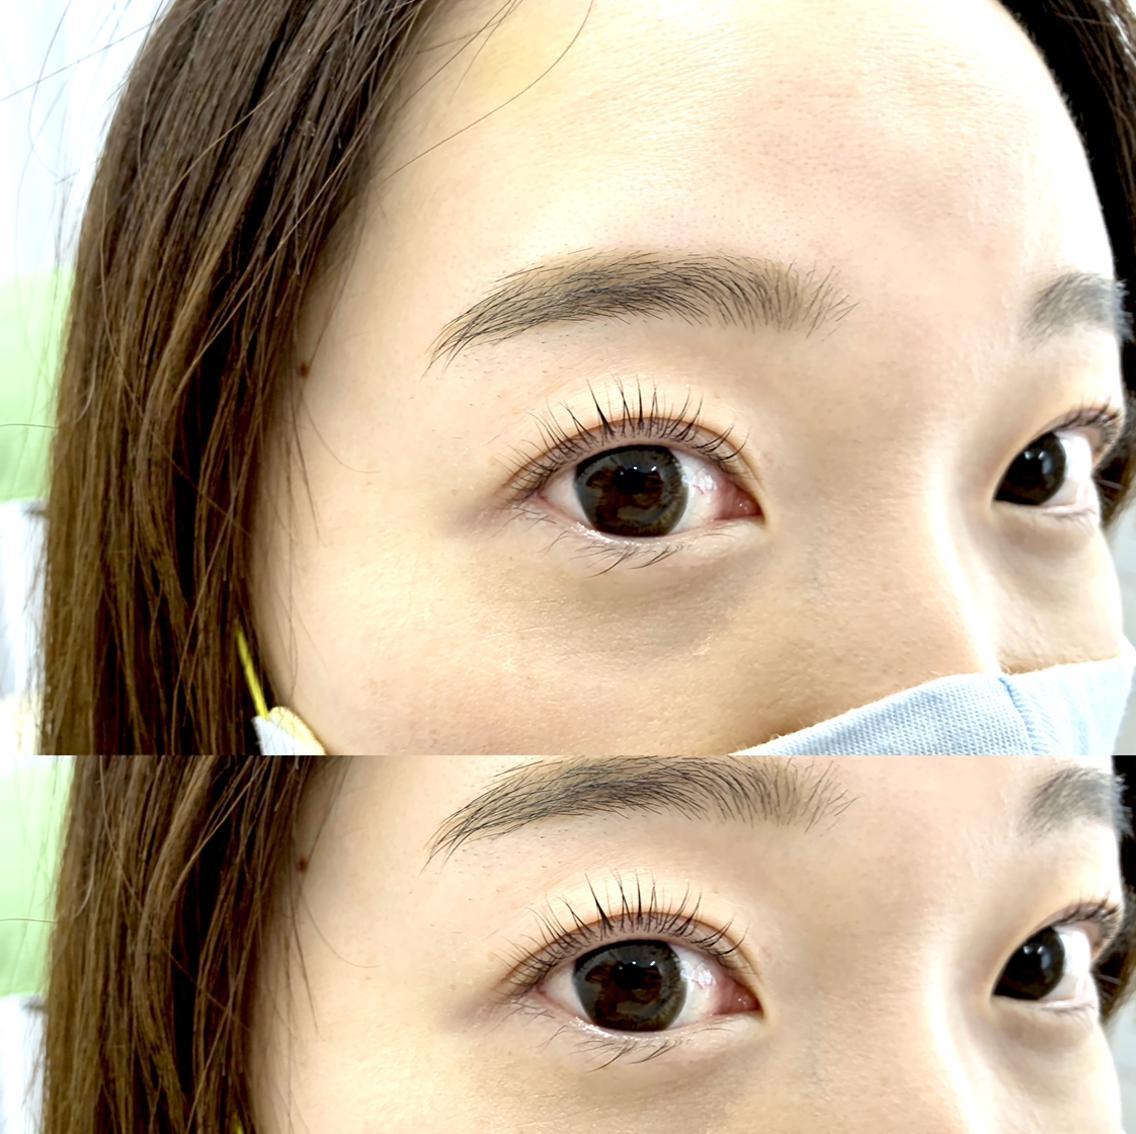 Angelique nail&eye  by Ifh本店所属・村岡 えりかの掲載